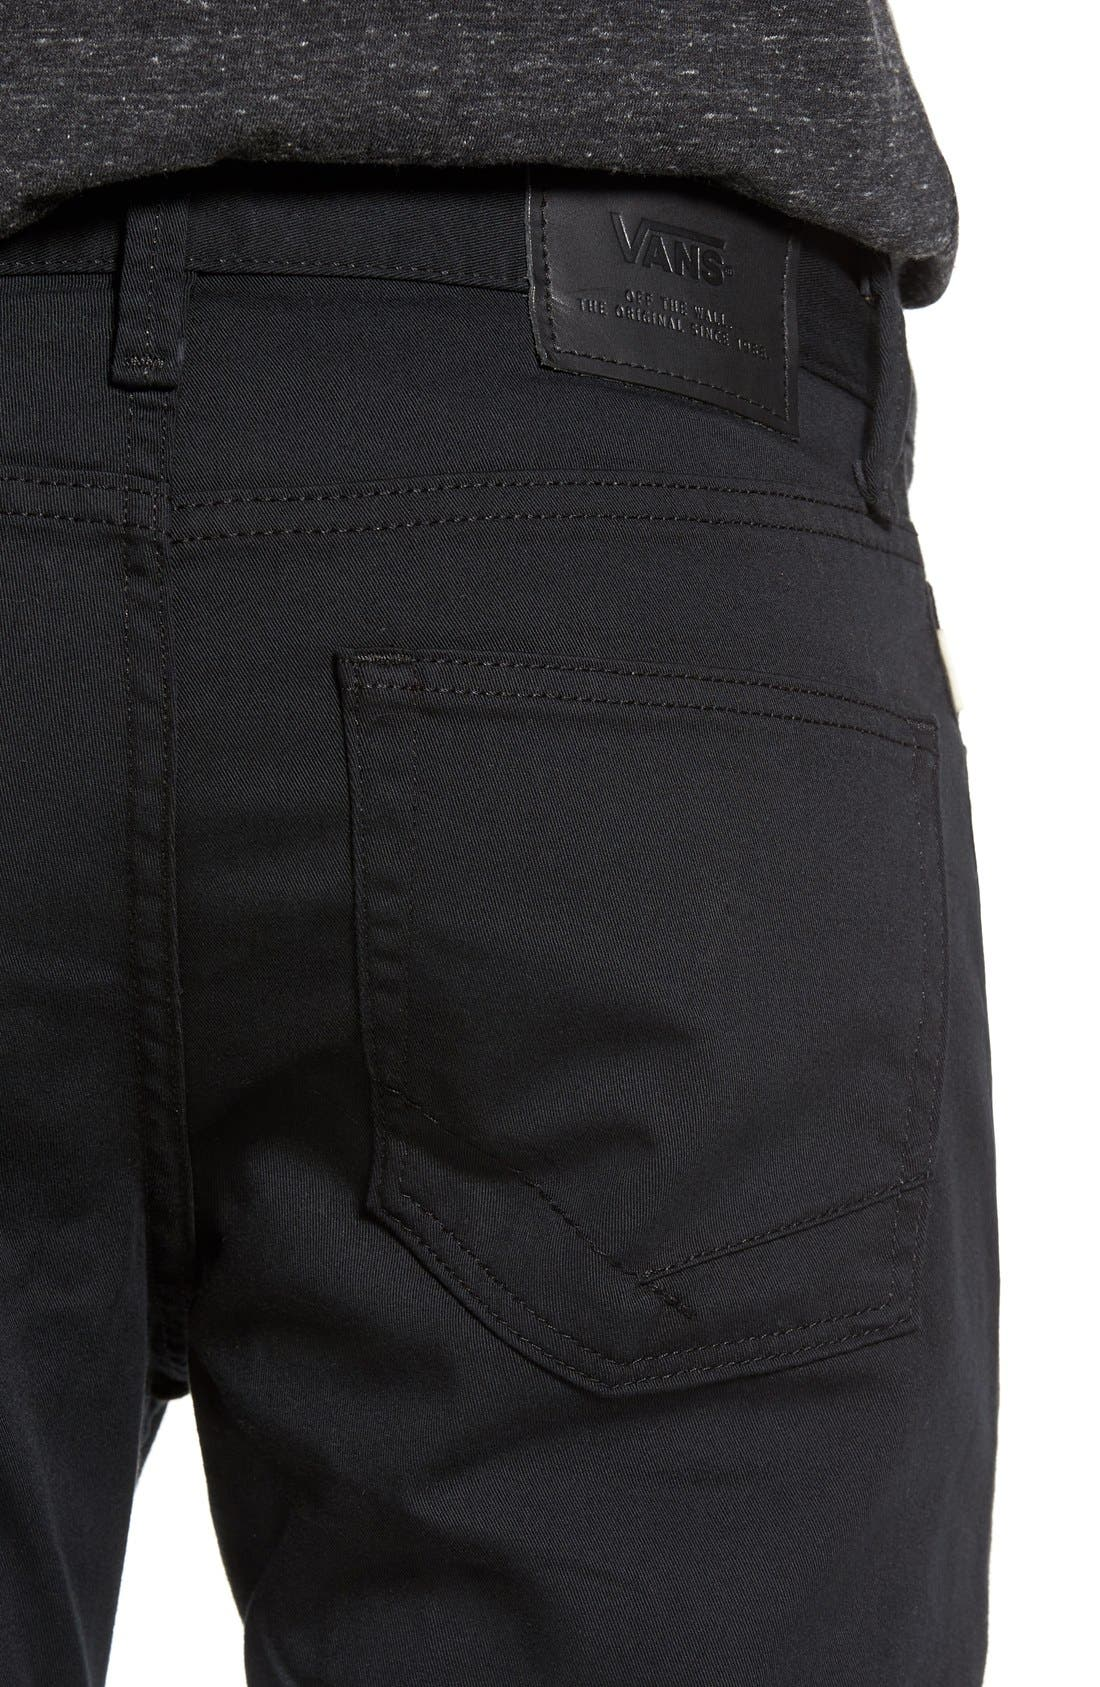 V56 Covina II Slim Fit Pants,                             Alternate thumbnail 22, color,